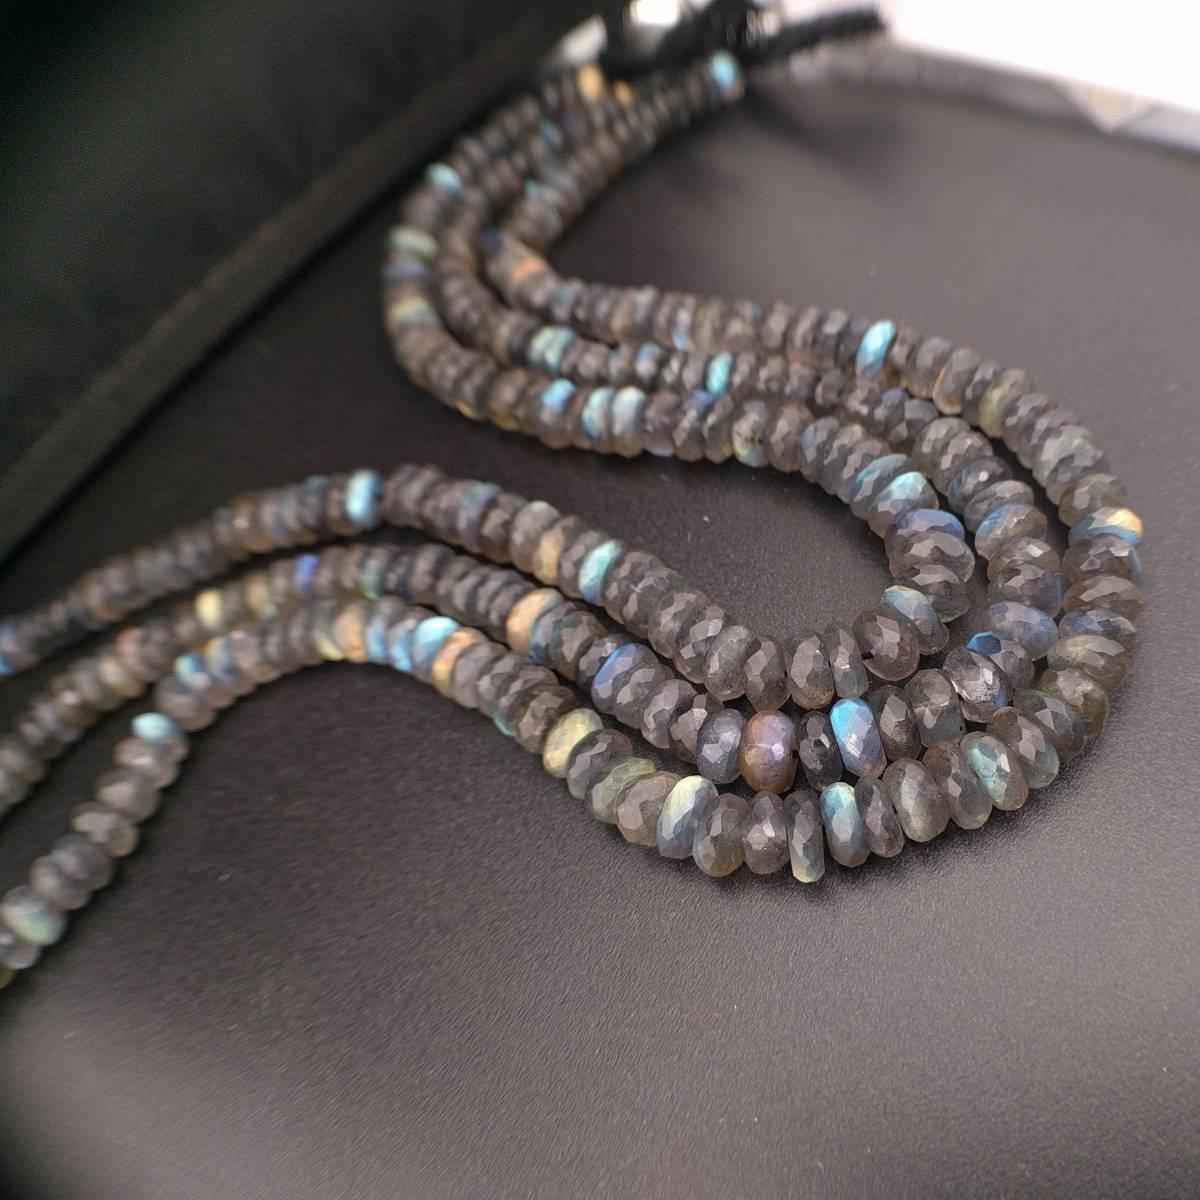 3x2MM Light Gray Labradorite Beads AAA Genuine Natural Gemstone Full Strand Faceted Rondelle Loose Beads 15 Bulk Lot Options 111779-3407